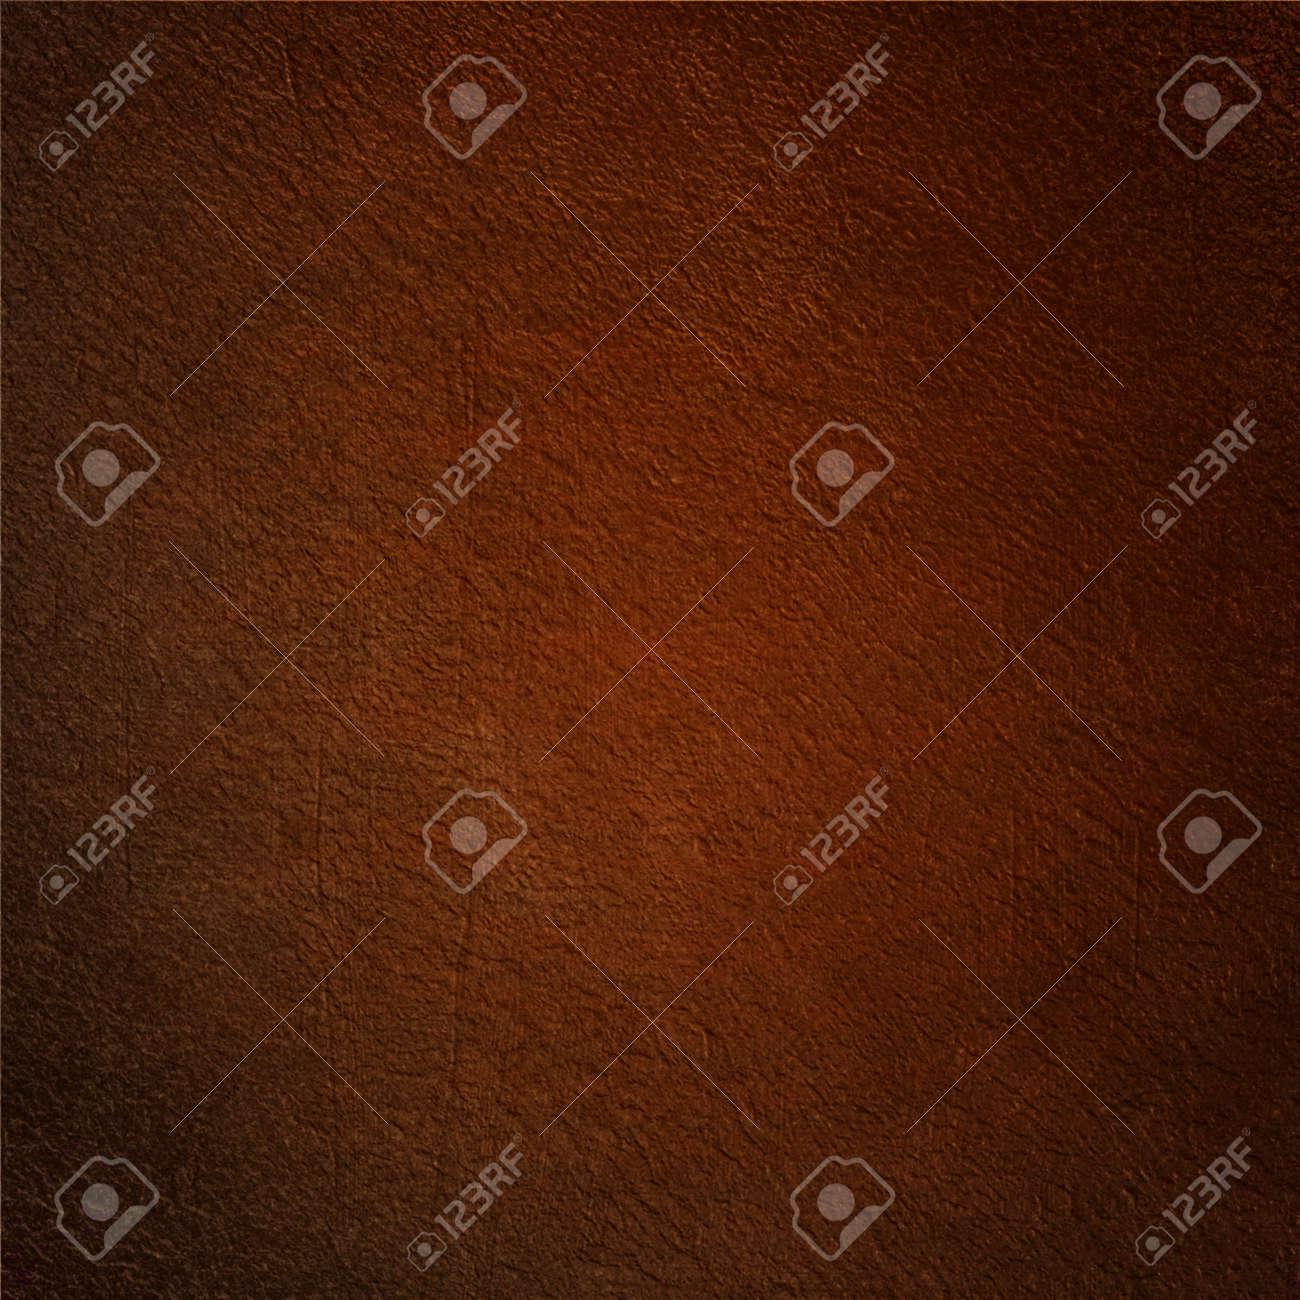 brown papyrus background texture vintage - 136187357